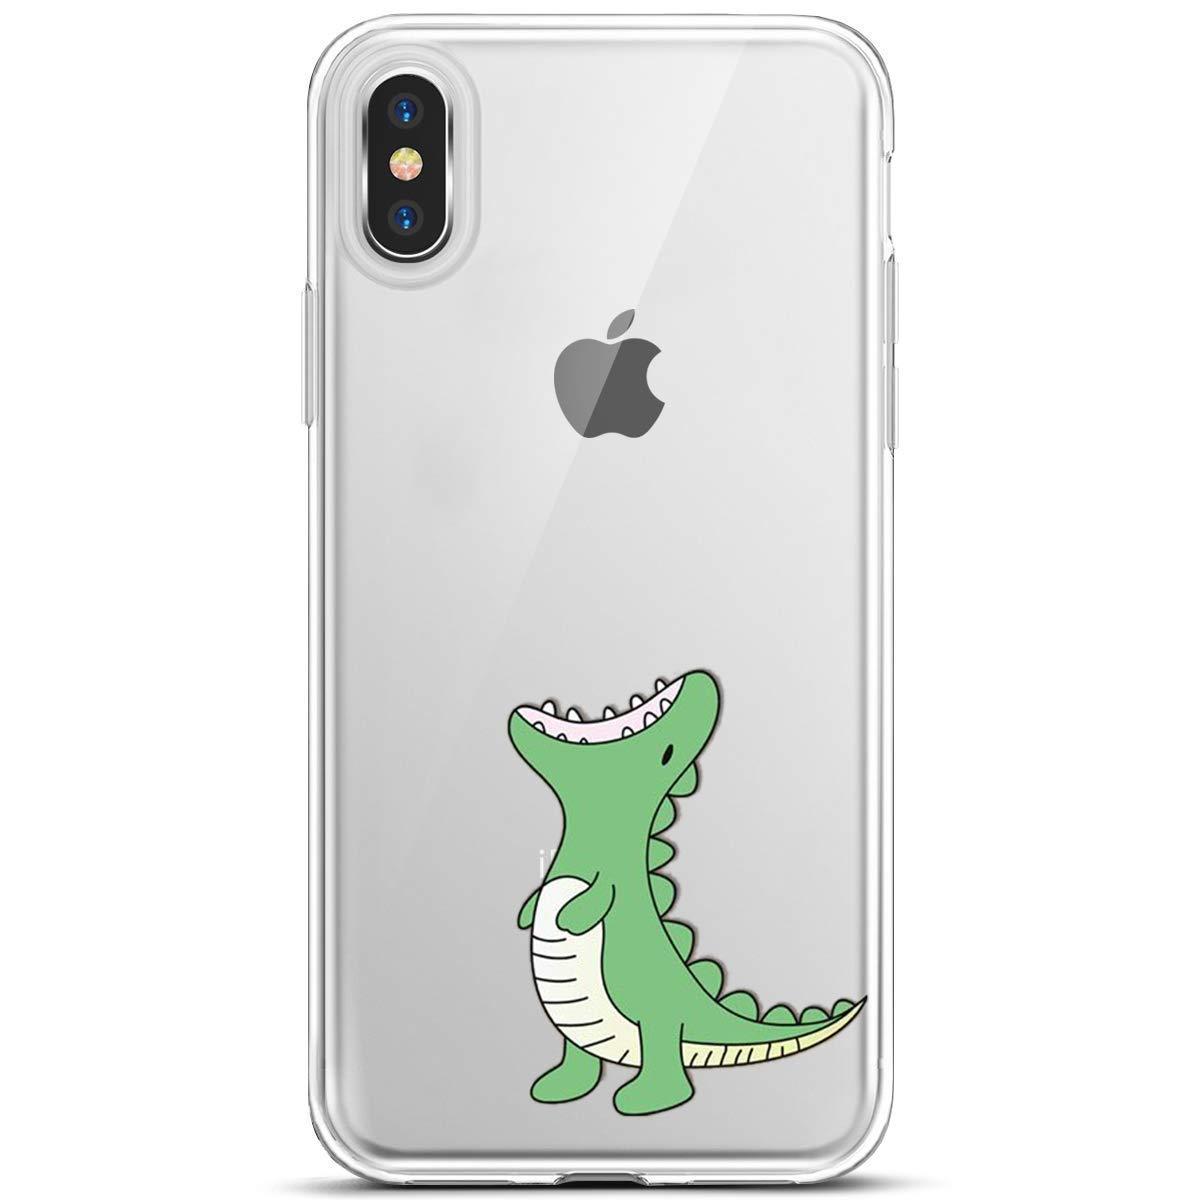 Bunt Muster Sto/ßfest Durchsichtig TPU Flexible Silikon Handyh/ülle Clear Crystal Schutzh/ülle,EINWEG MoreChioce kompatibel mit iPhone XS H/ülle,kompatibel mit iPhone XS Transparent